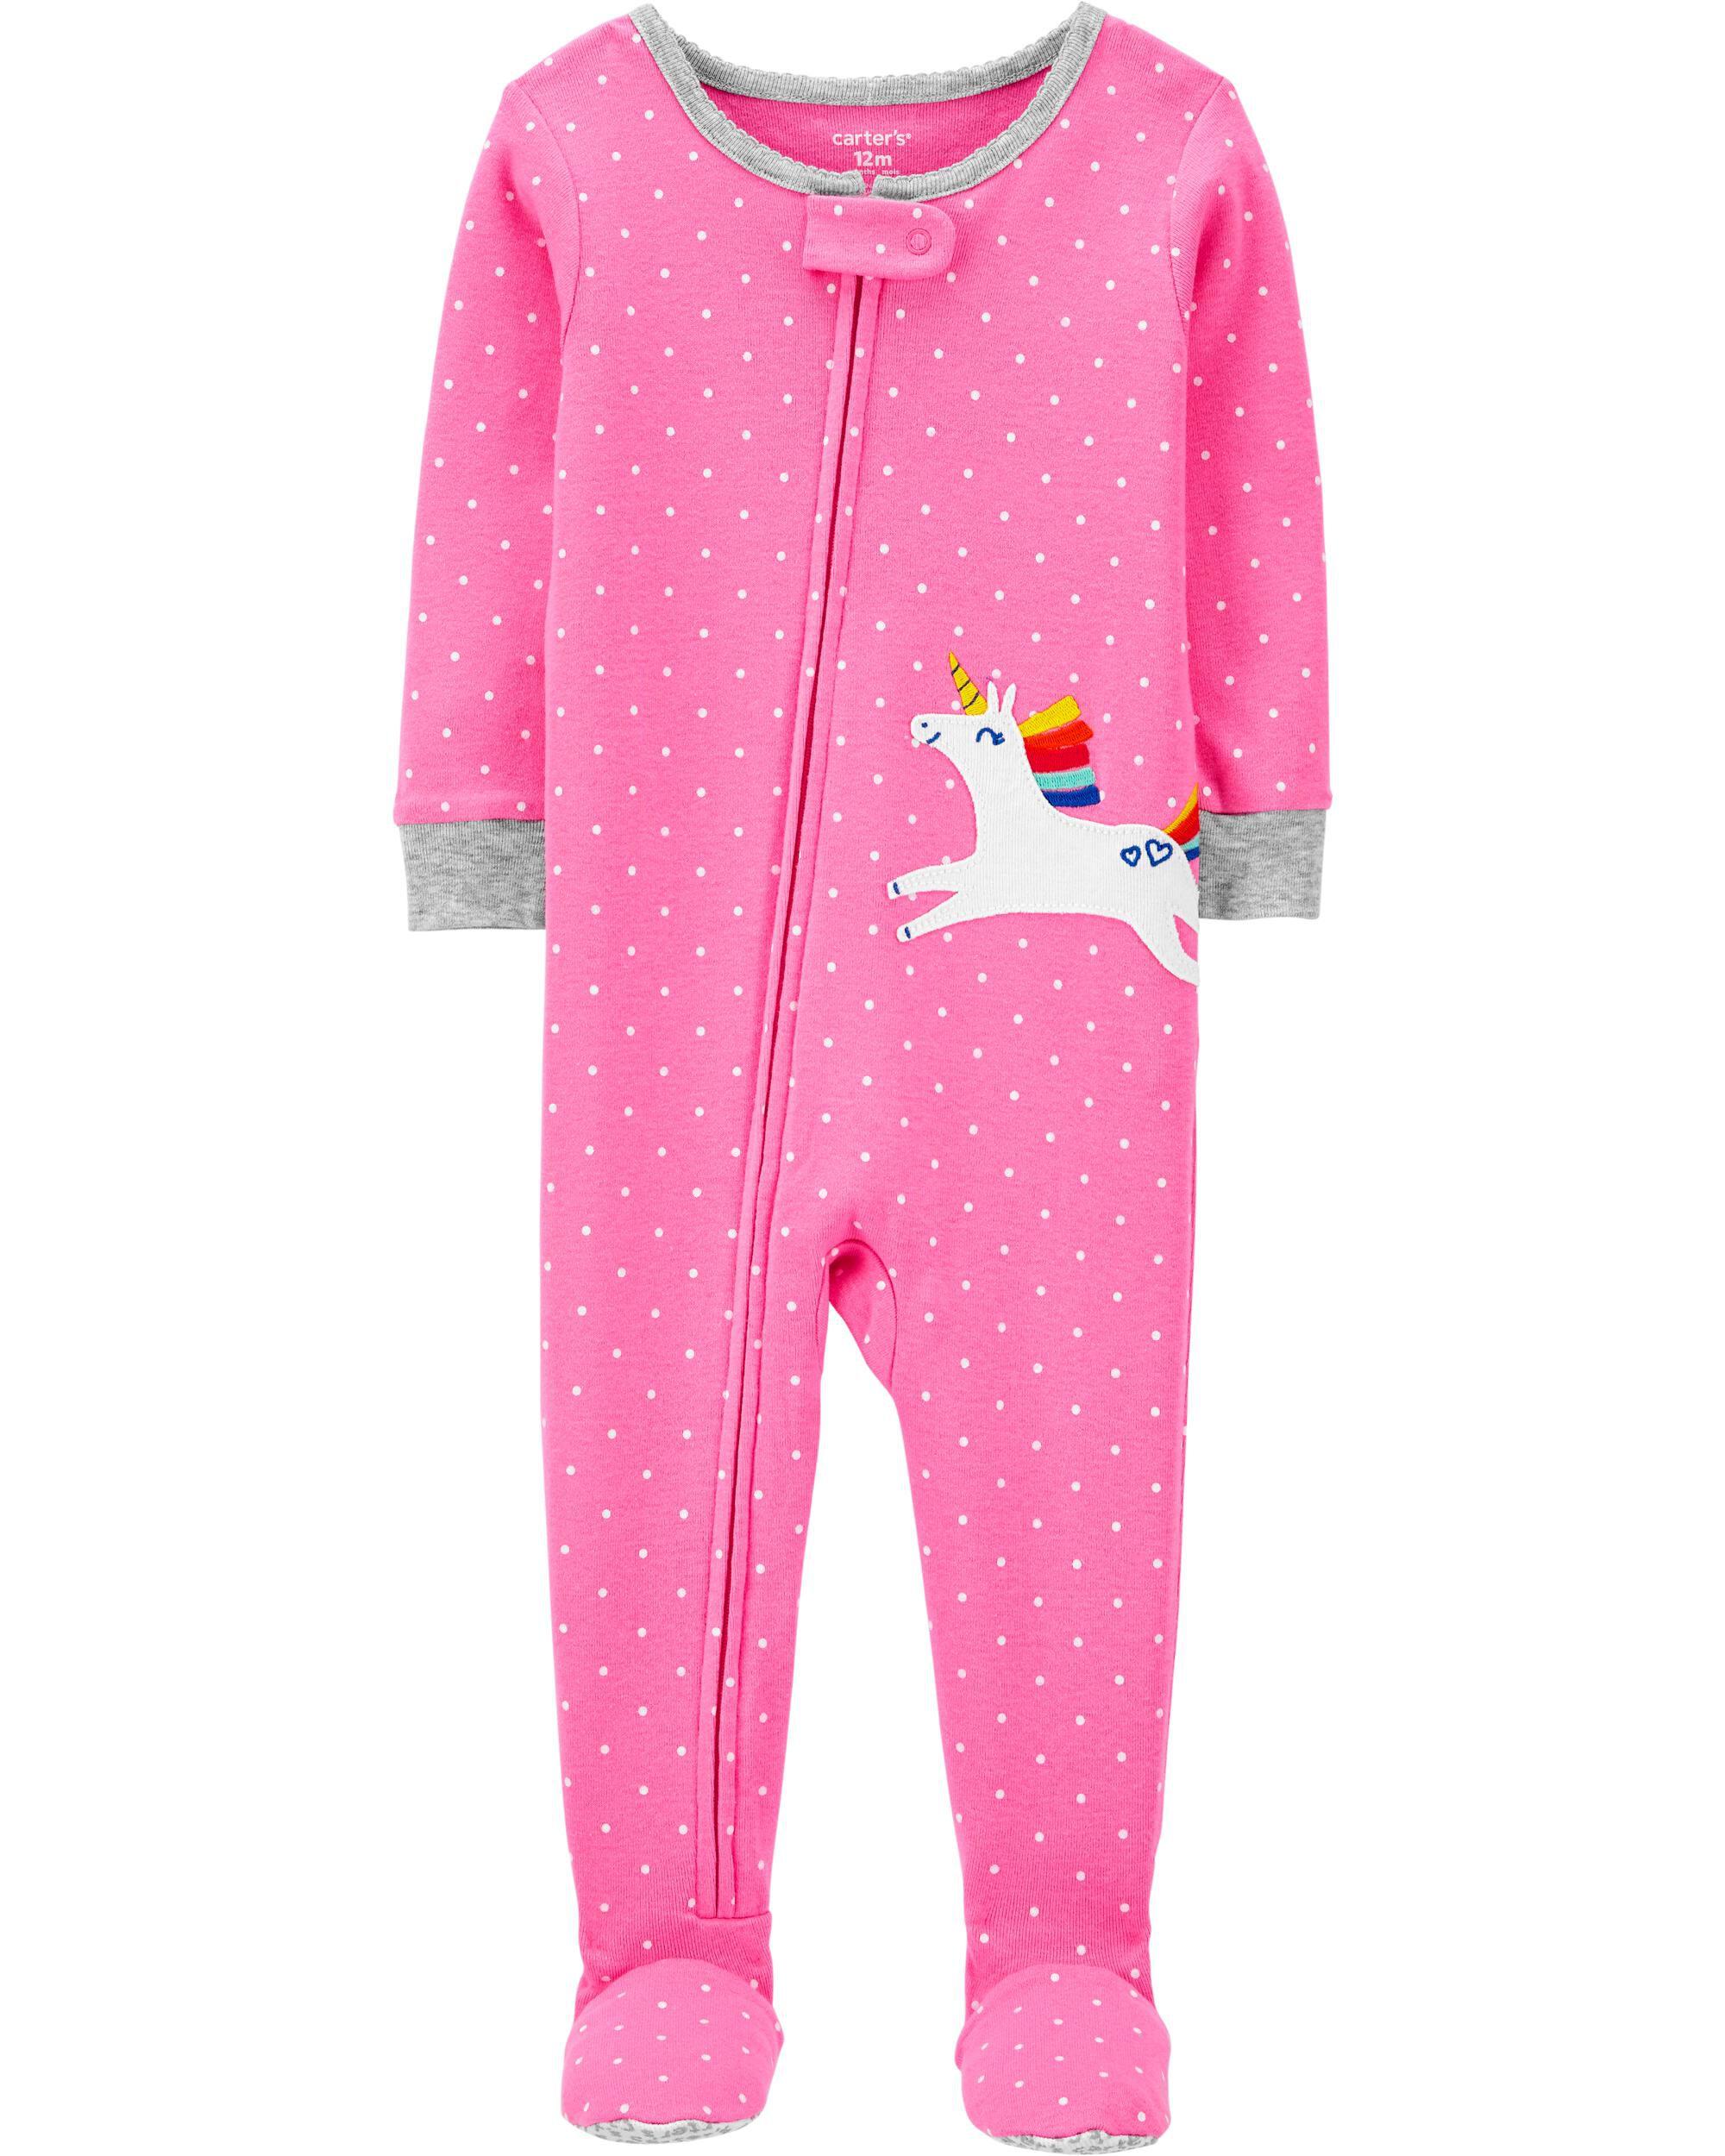 Boys Infant 3 6 9 Month My First Christmas Blanket Sleeper Pajamas Reindeer Feet